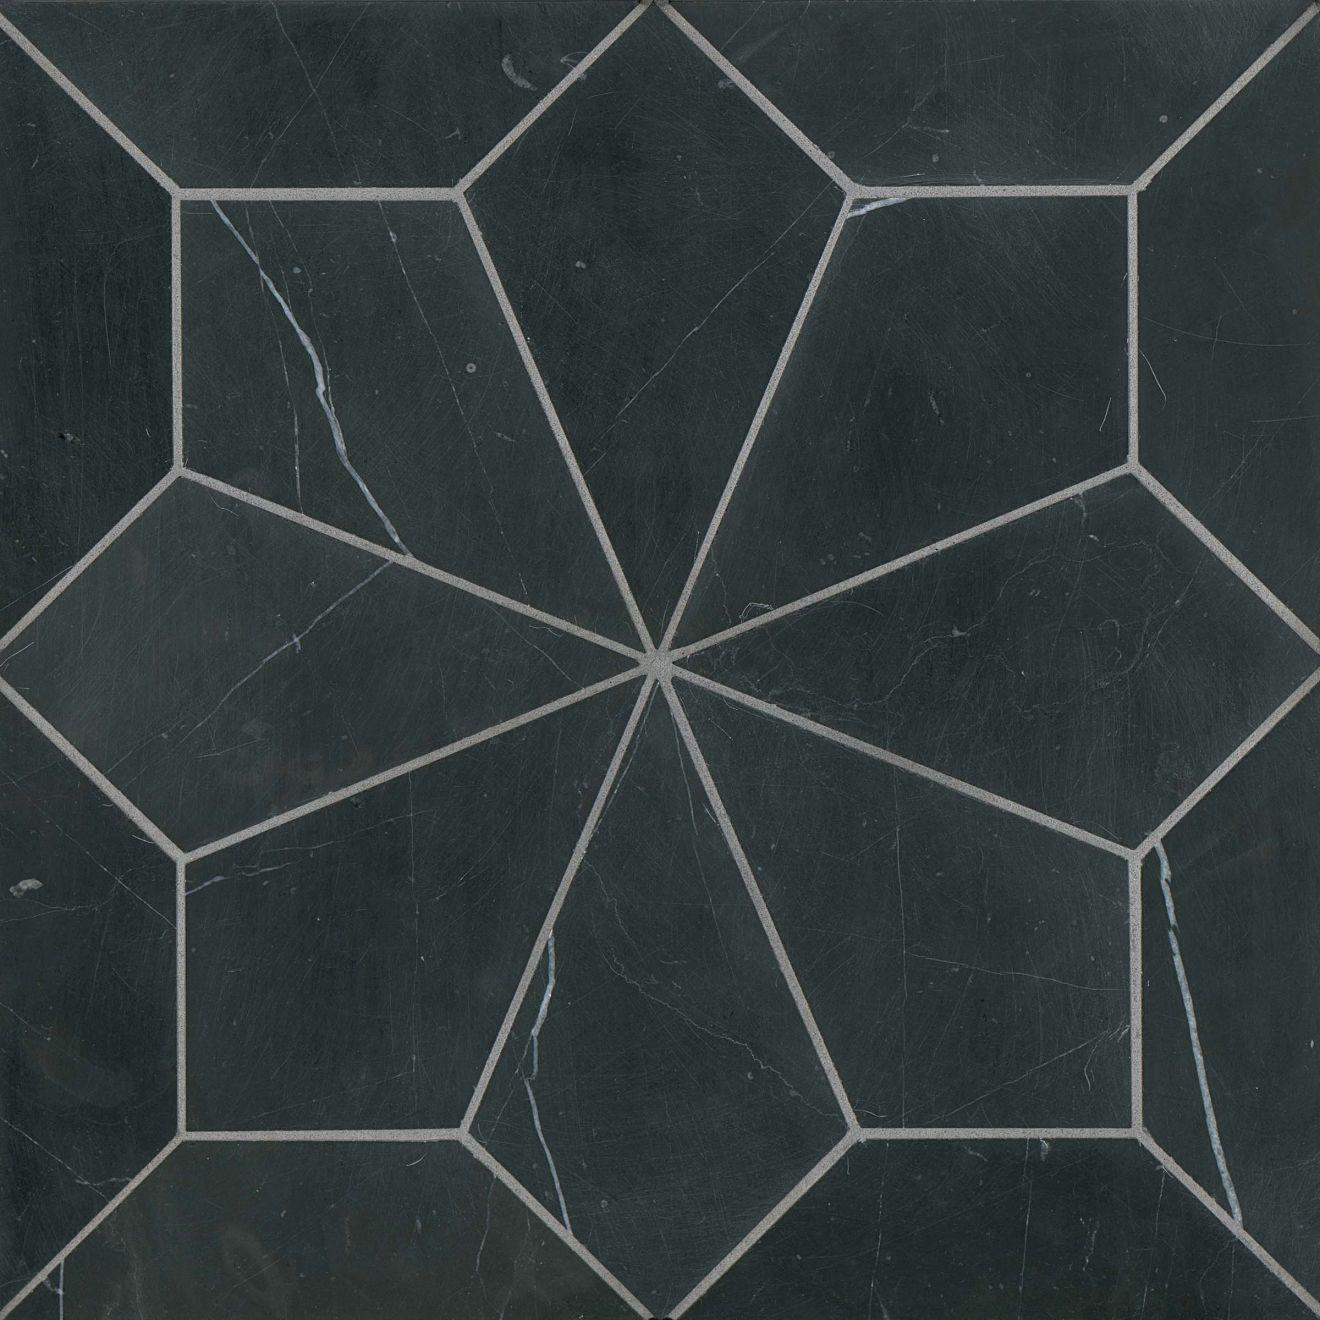 Blomma Floor & Wall Mosaic in Nero